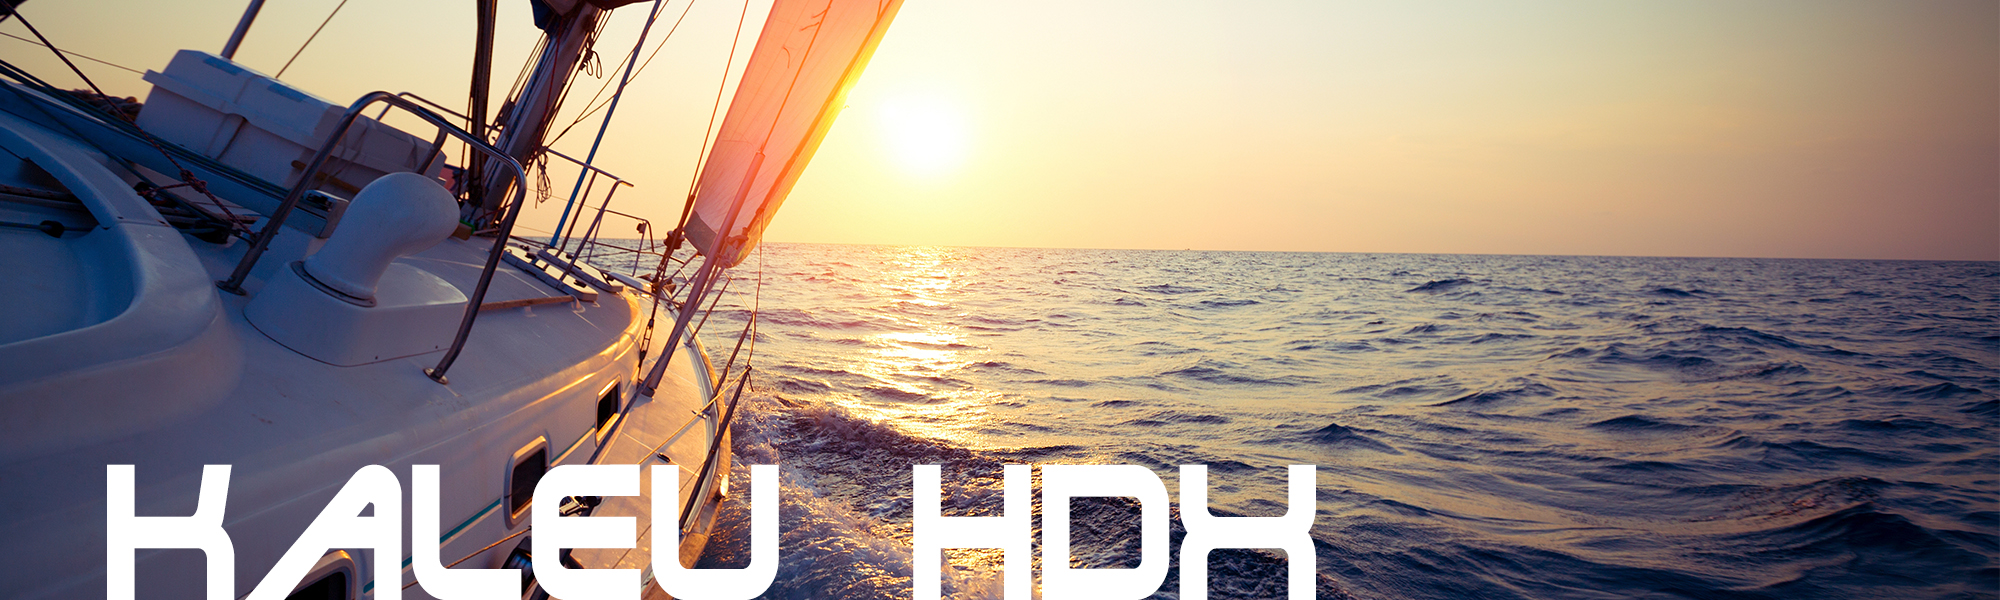 media/image/DDoptics-LP-Kaleu-HDX-Fernglas-Banner-oben-neu.jpg